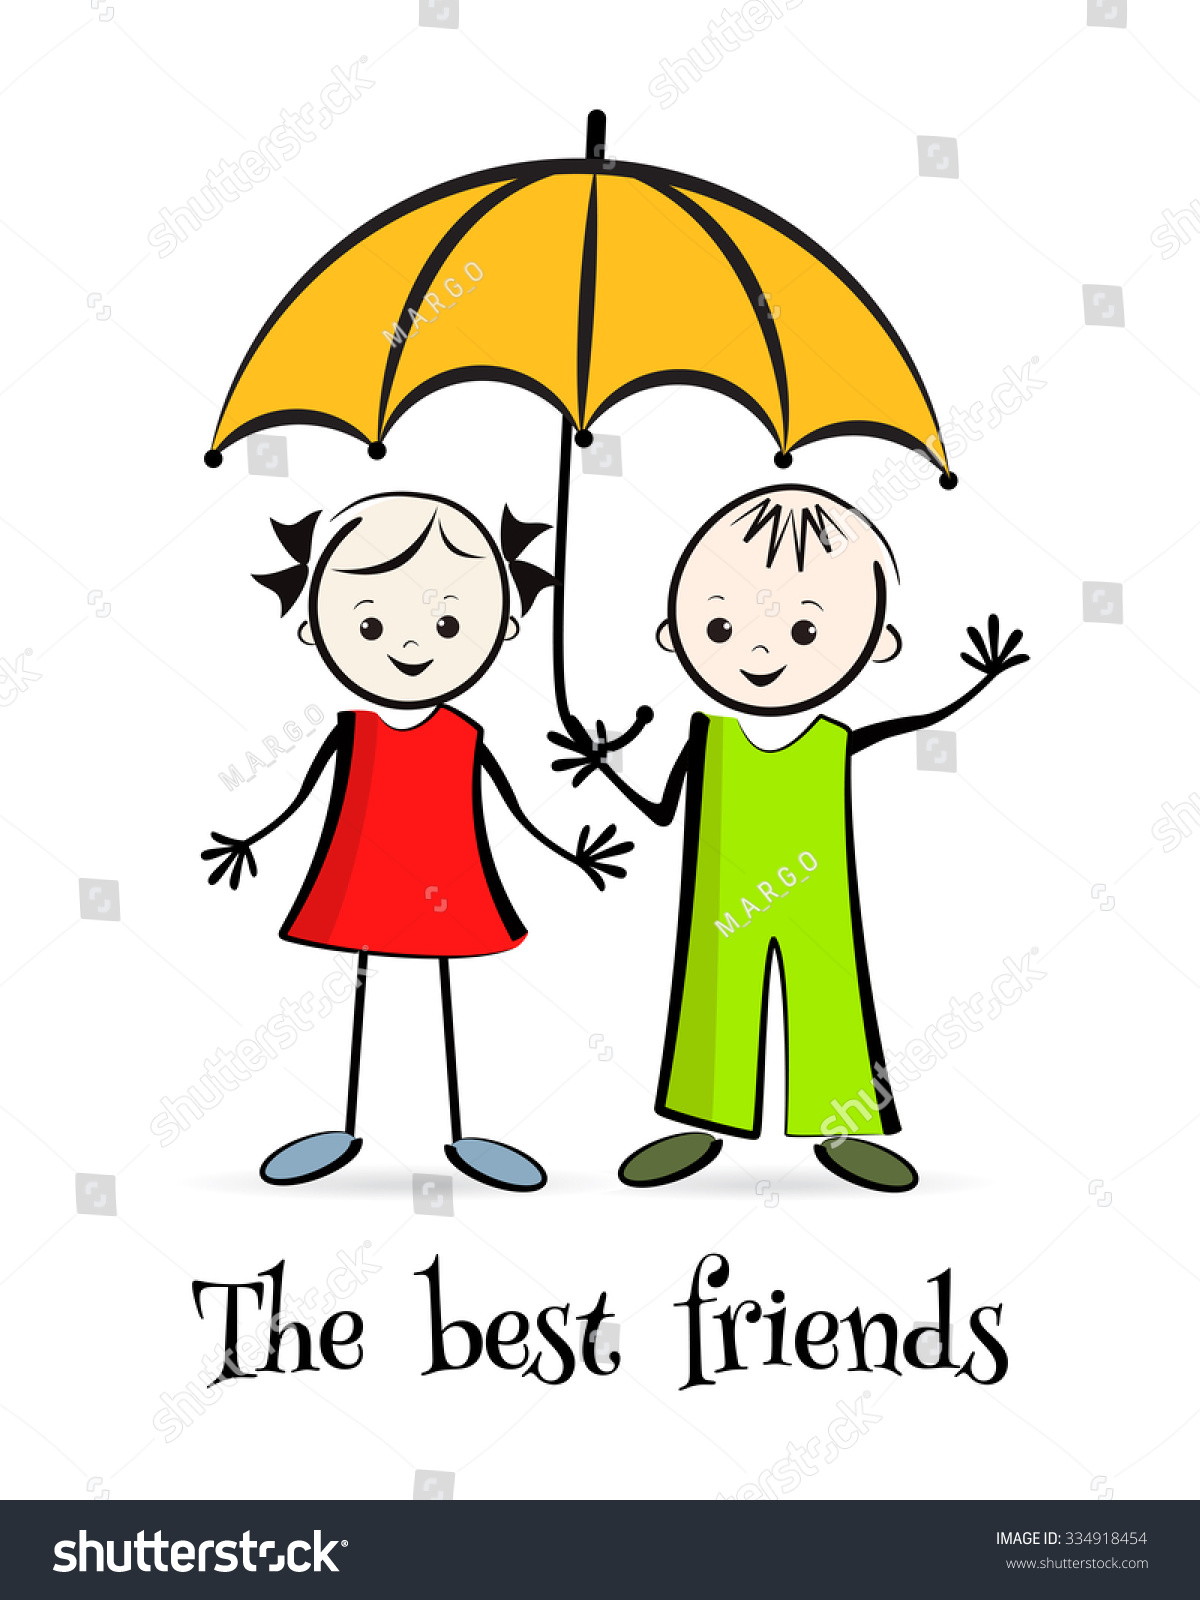 465b076f Happy Children Best Friends Tshirt Design Stock Vector (Royalty Free ...